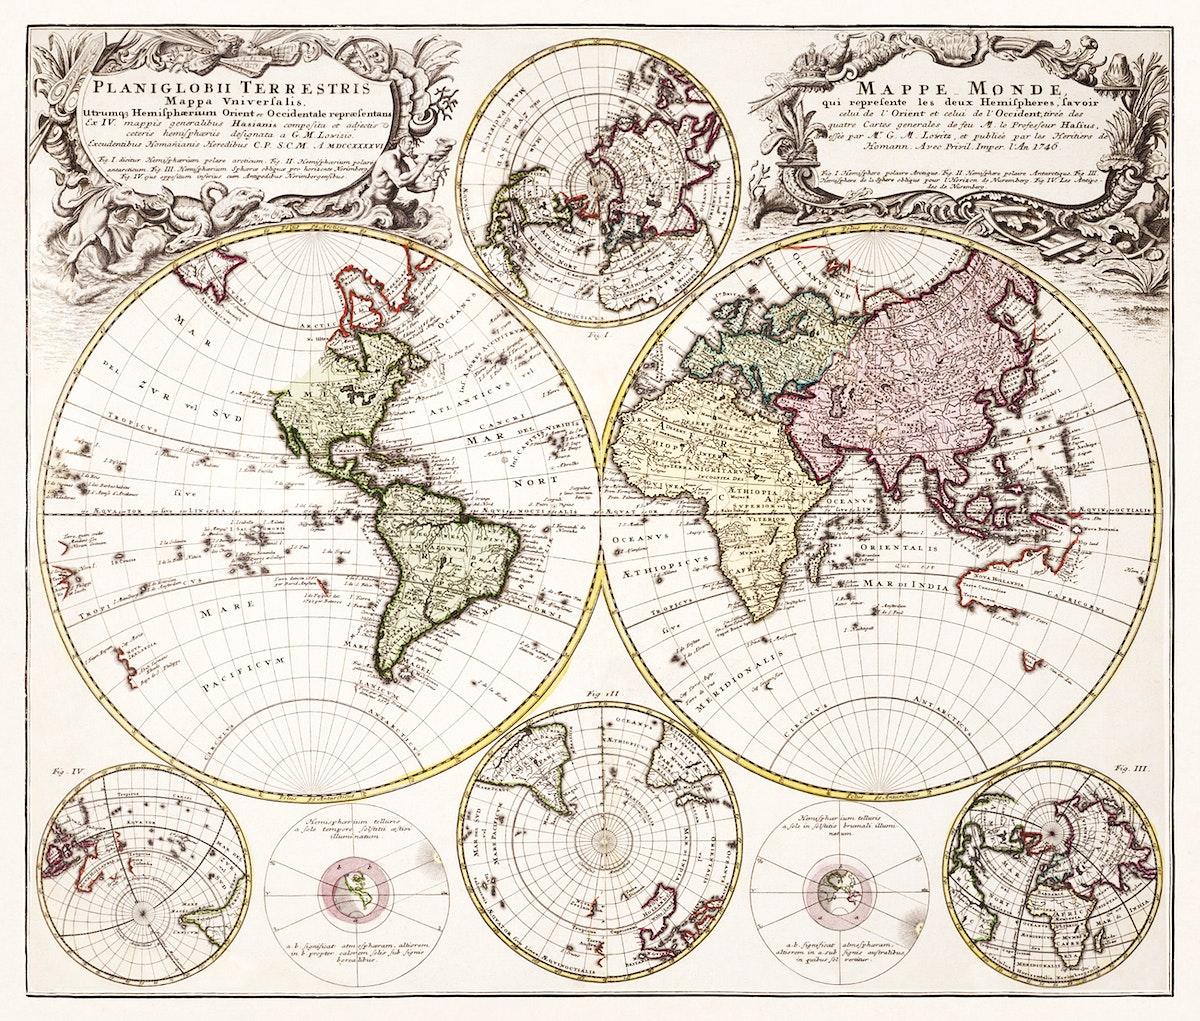 Planiglobii terrestris mappa vniversalis (1746) by George Moritz, Johann Matthias Hase, and Homann Erben. Original from The…